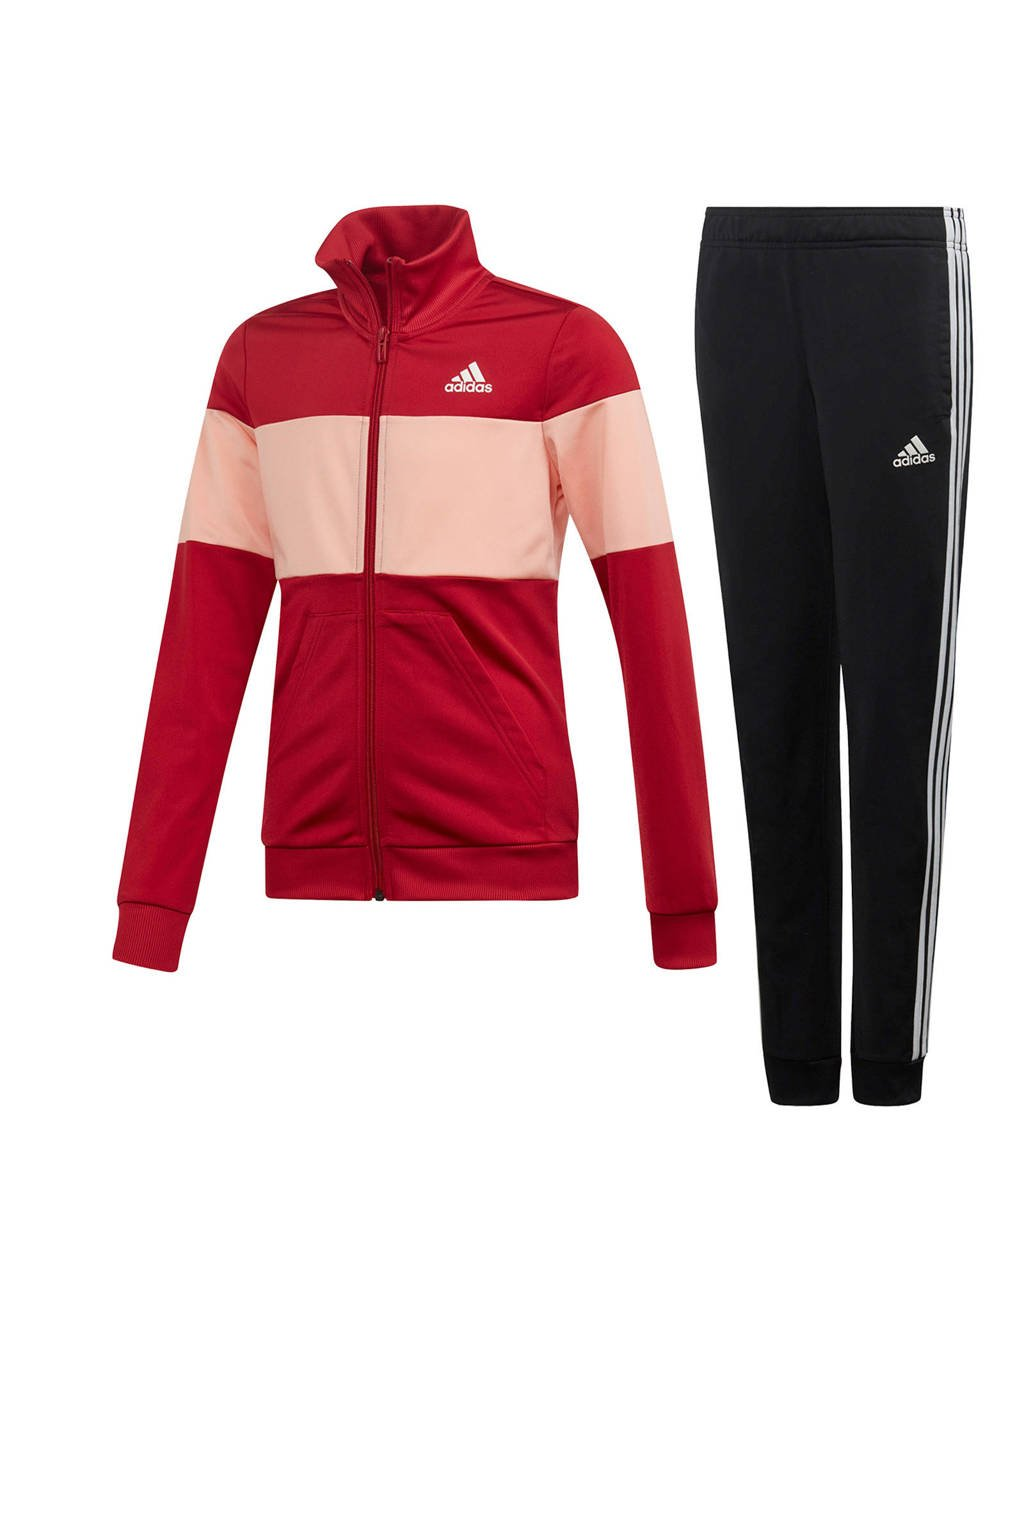 adidas performance trainingspak rood/zwart, Rood/roze/zwart